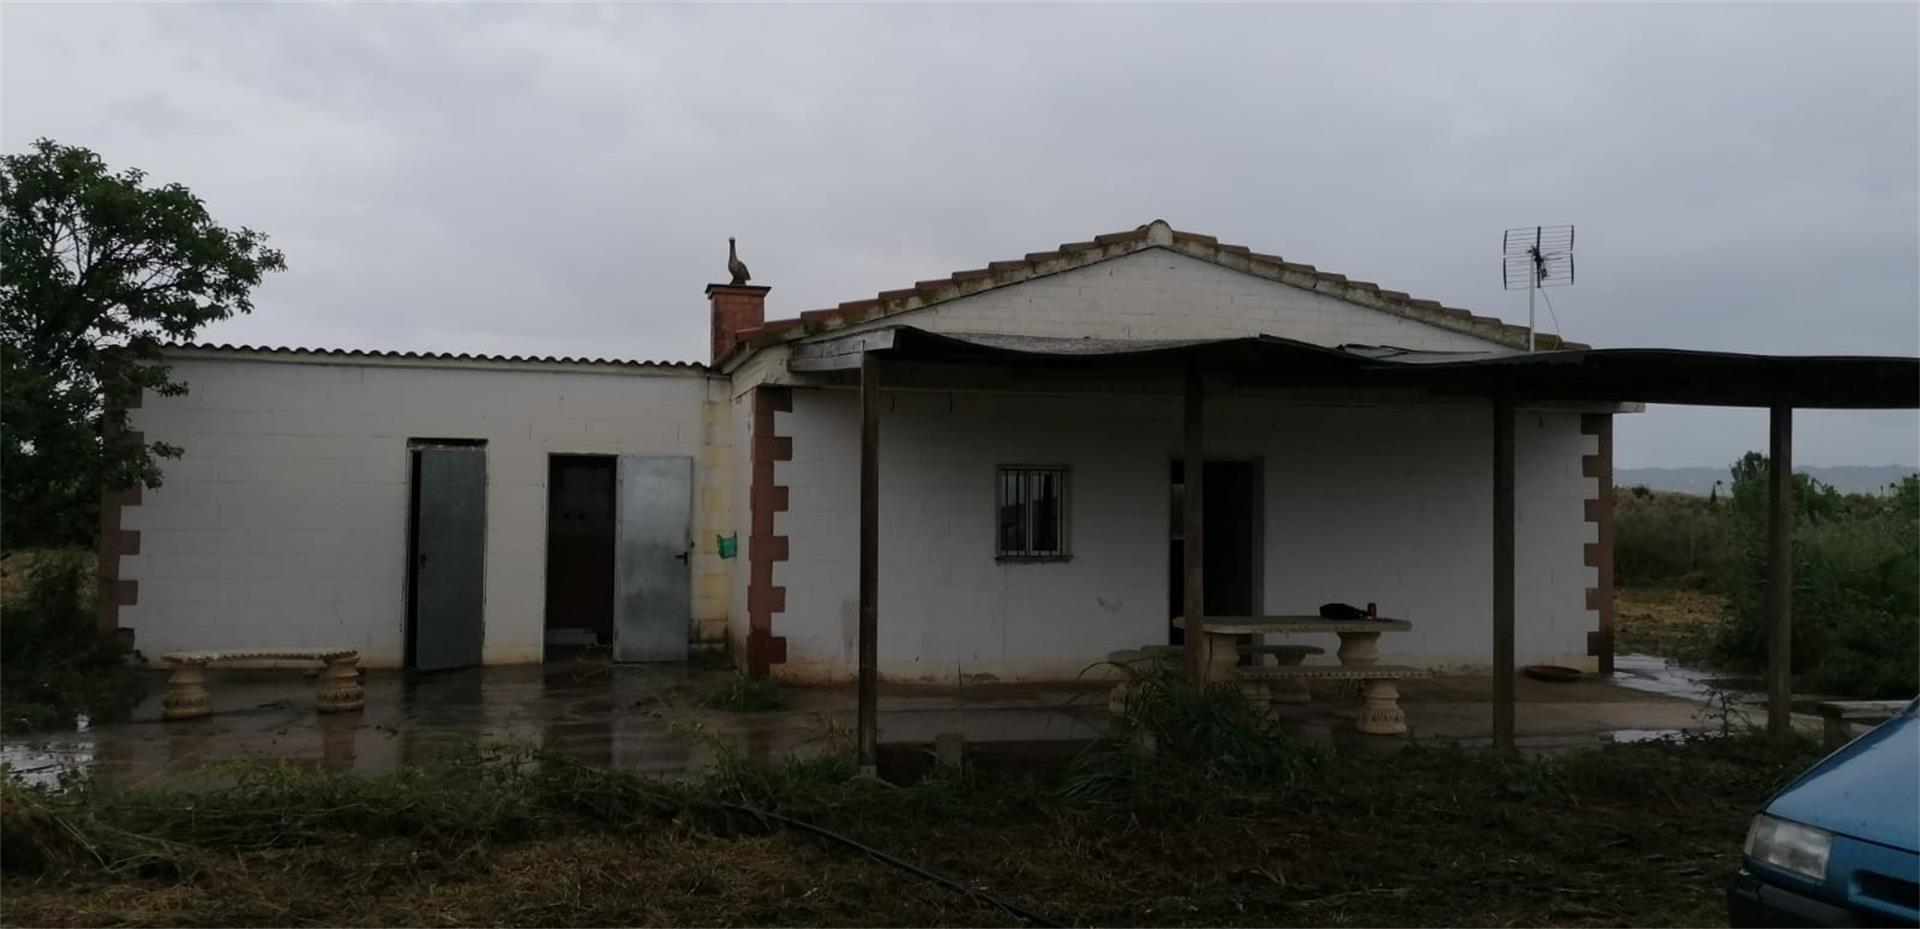 Maison à Alcarràs. Alcarràs